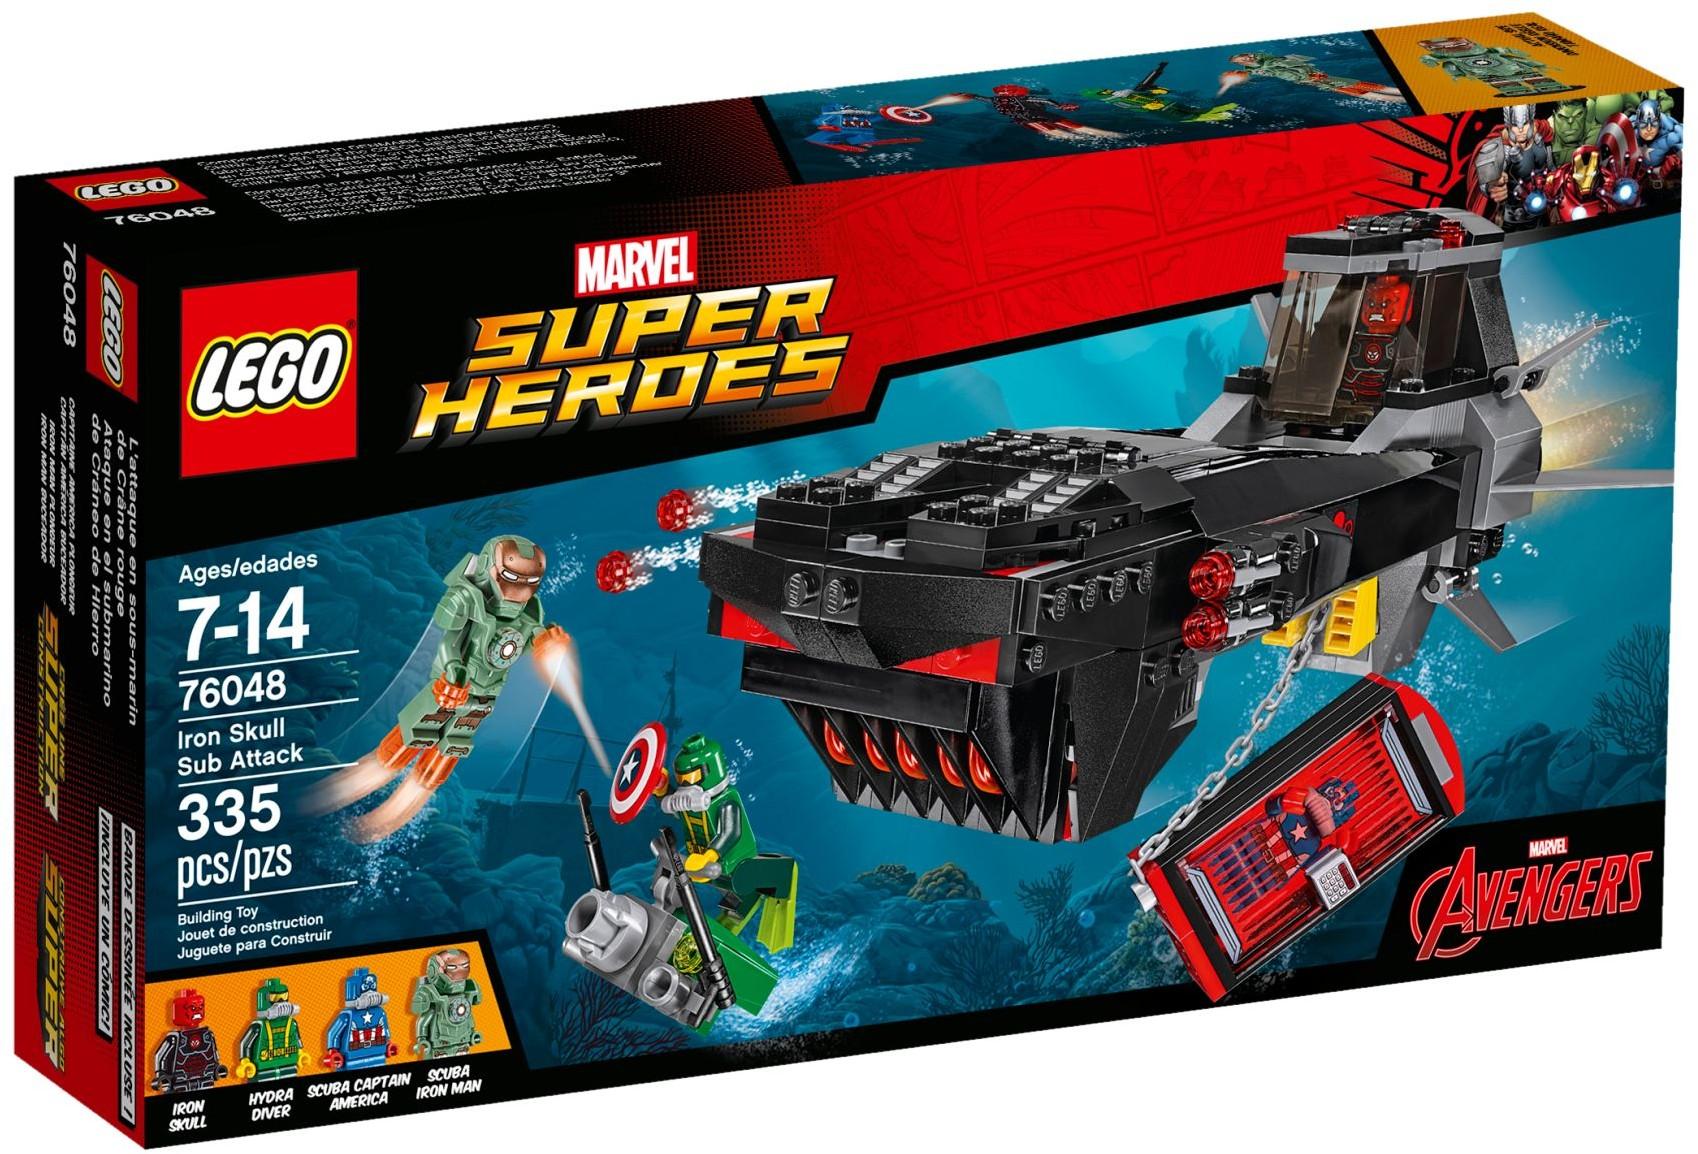 LEGO 76048 - Super Heroes - Iron Skull Sub Attack